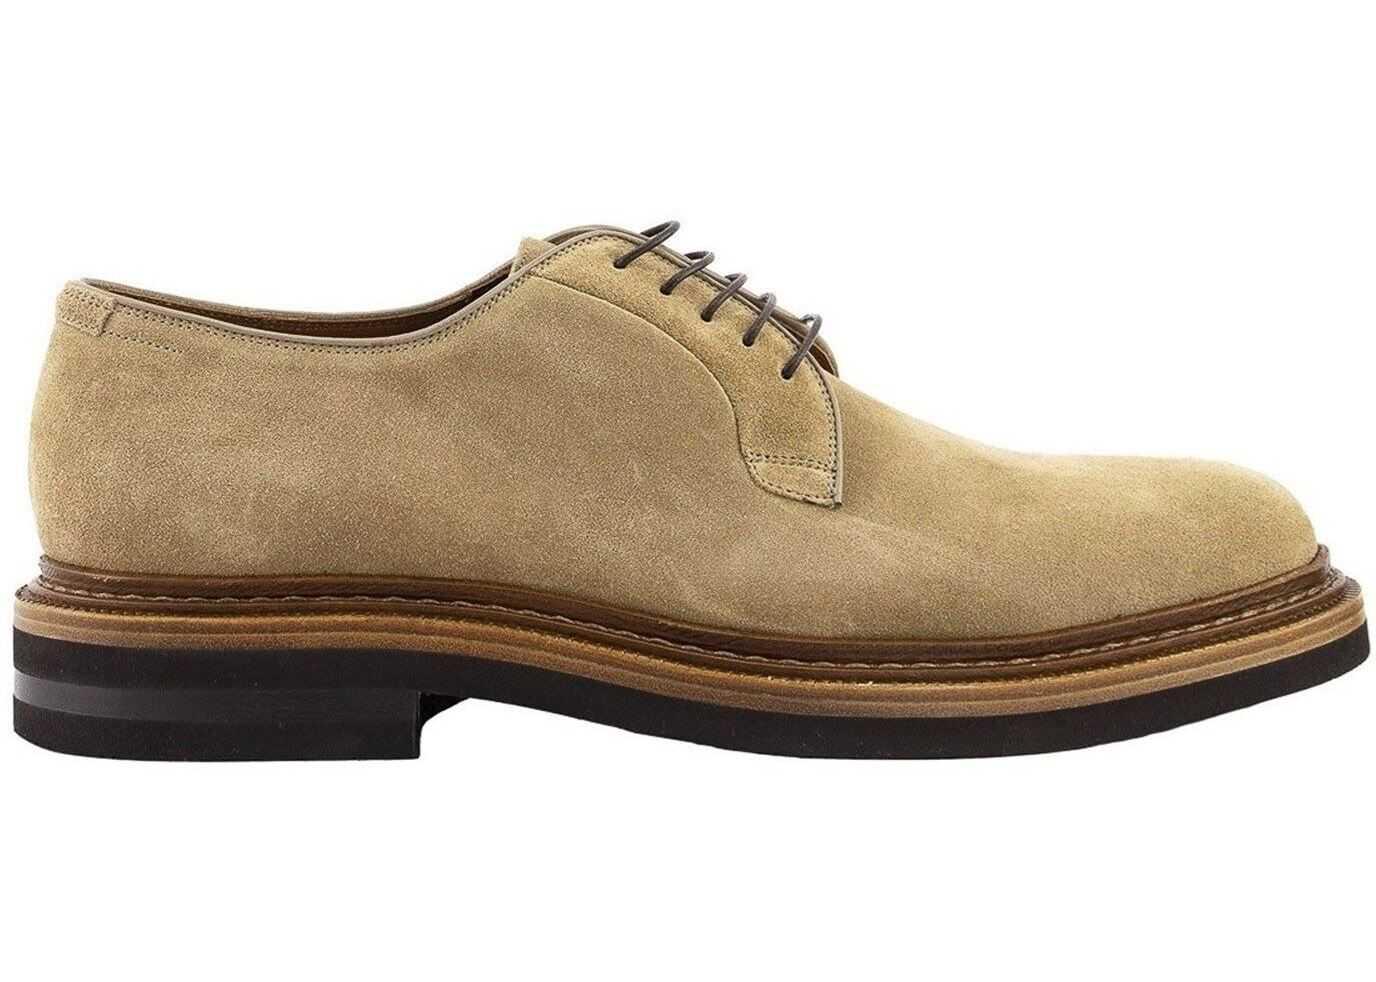 Brunello Cucinelli Oiled Leather Derby Shoes In Grey MZUNETK856 C6559 Beige imagine b-mall.ro